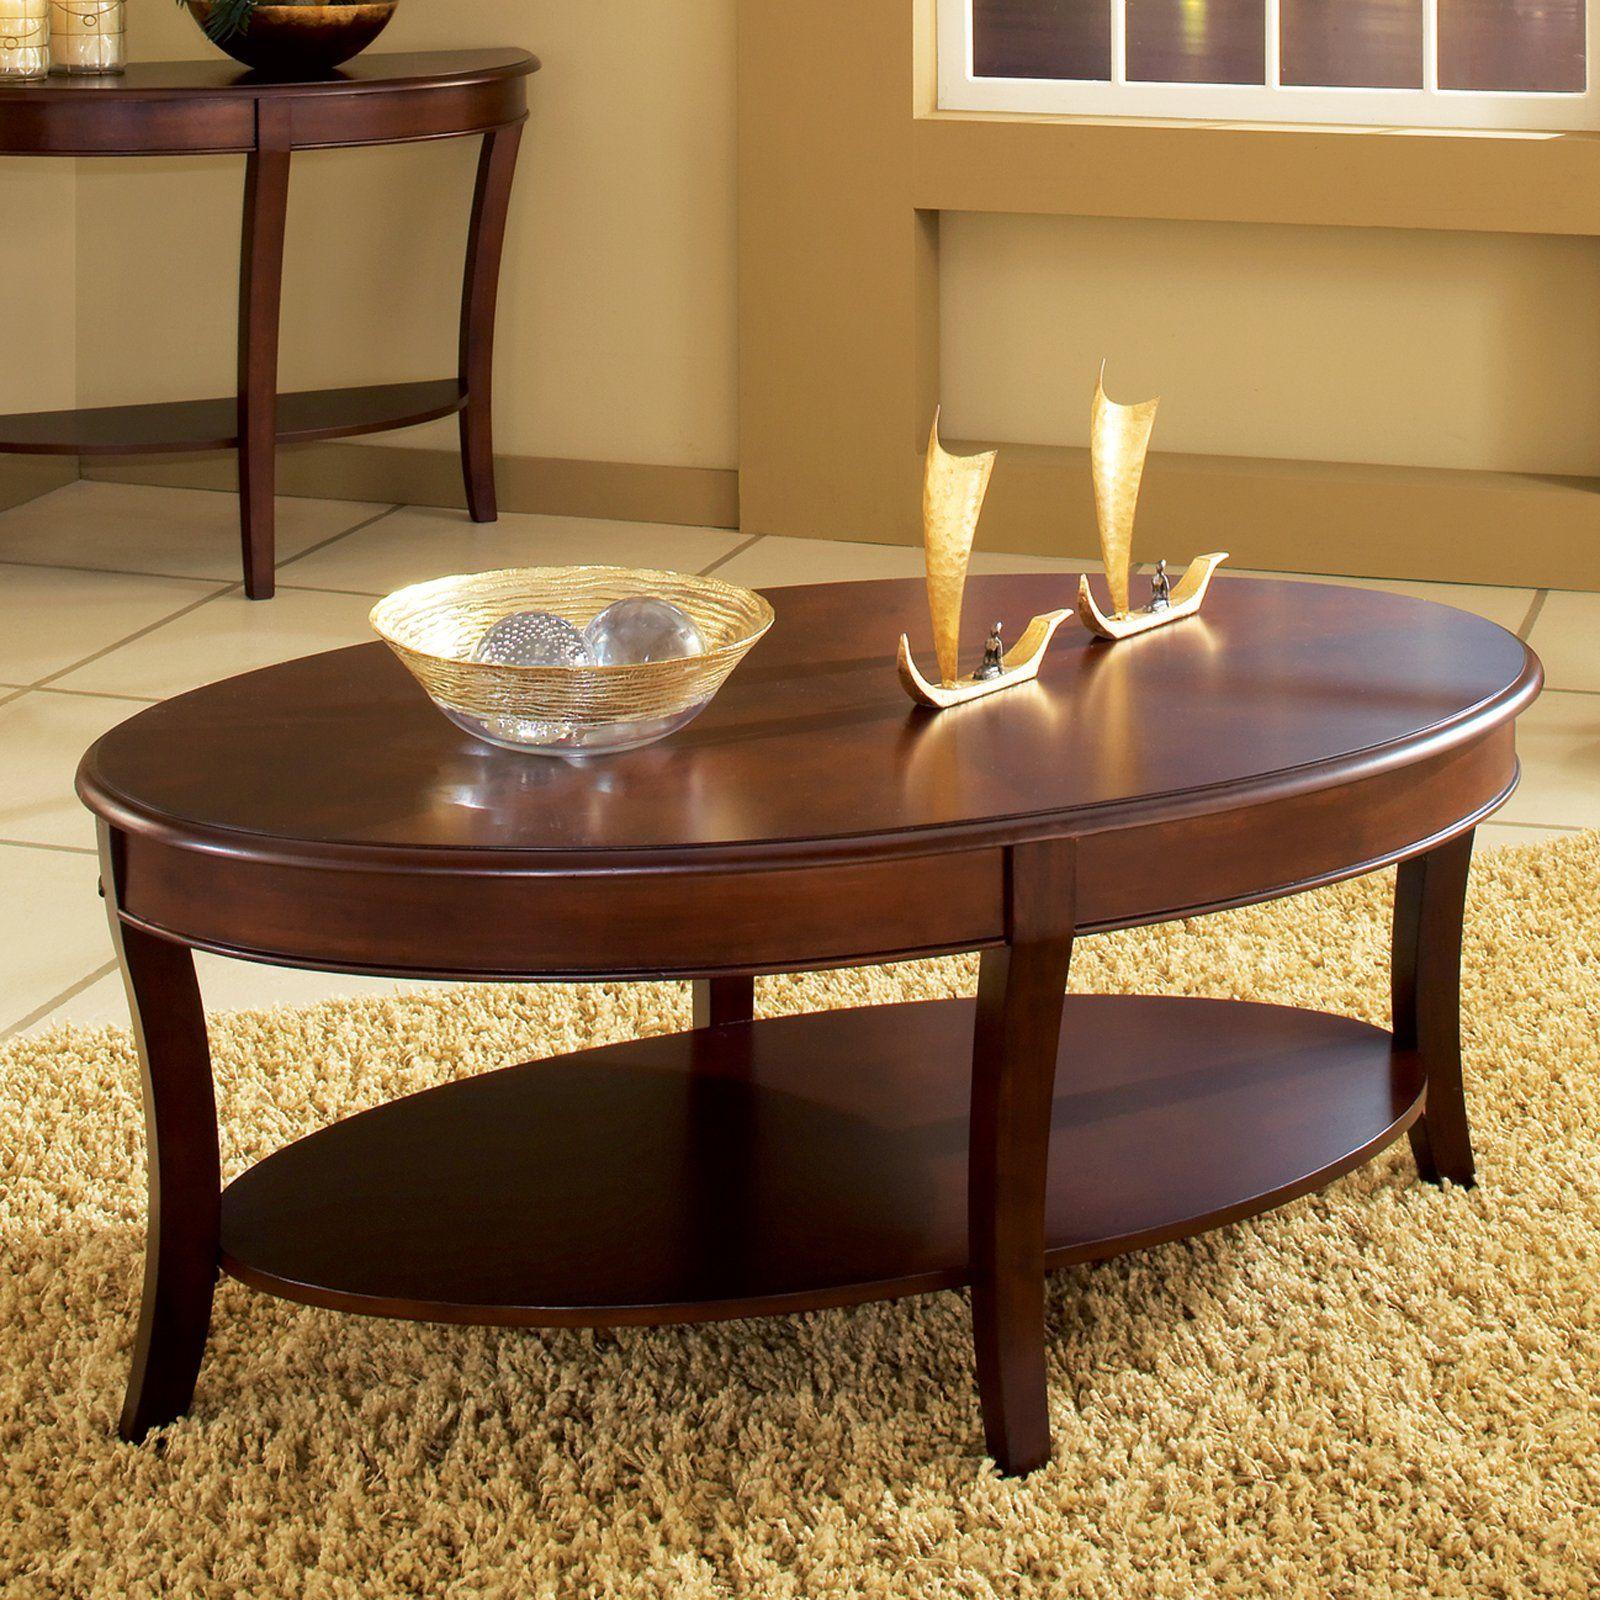 Steve Silver Troy Oval Cherry Wood Coffee Table Www Hayneedle Com Oval Coffee Tables Cherry Wood Coffee Table Coffee Table [ 1600 x 1600 Pixel ]